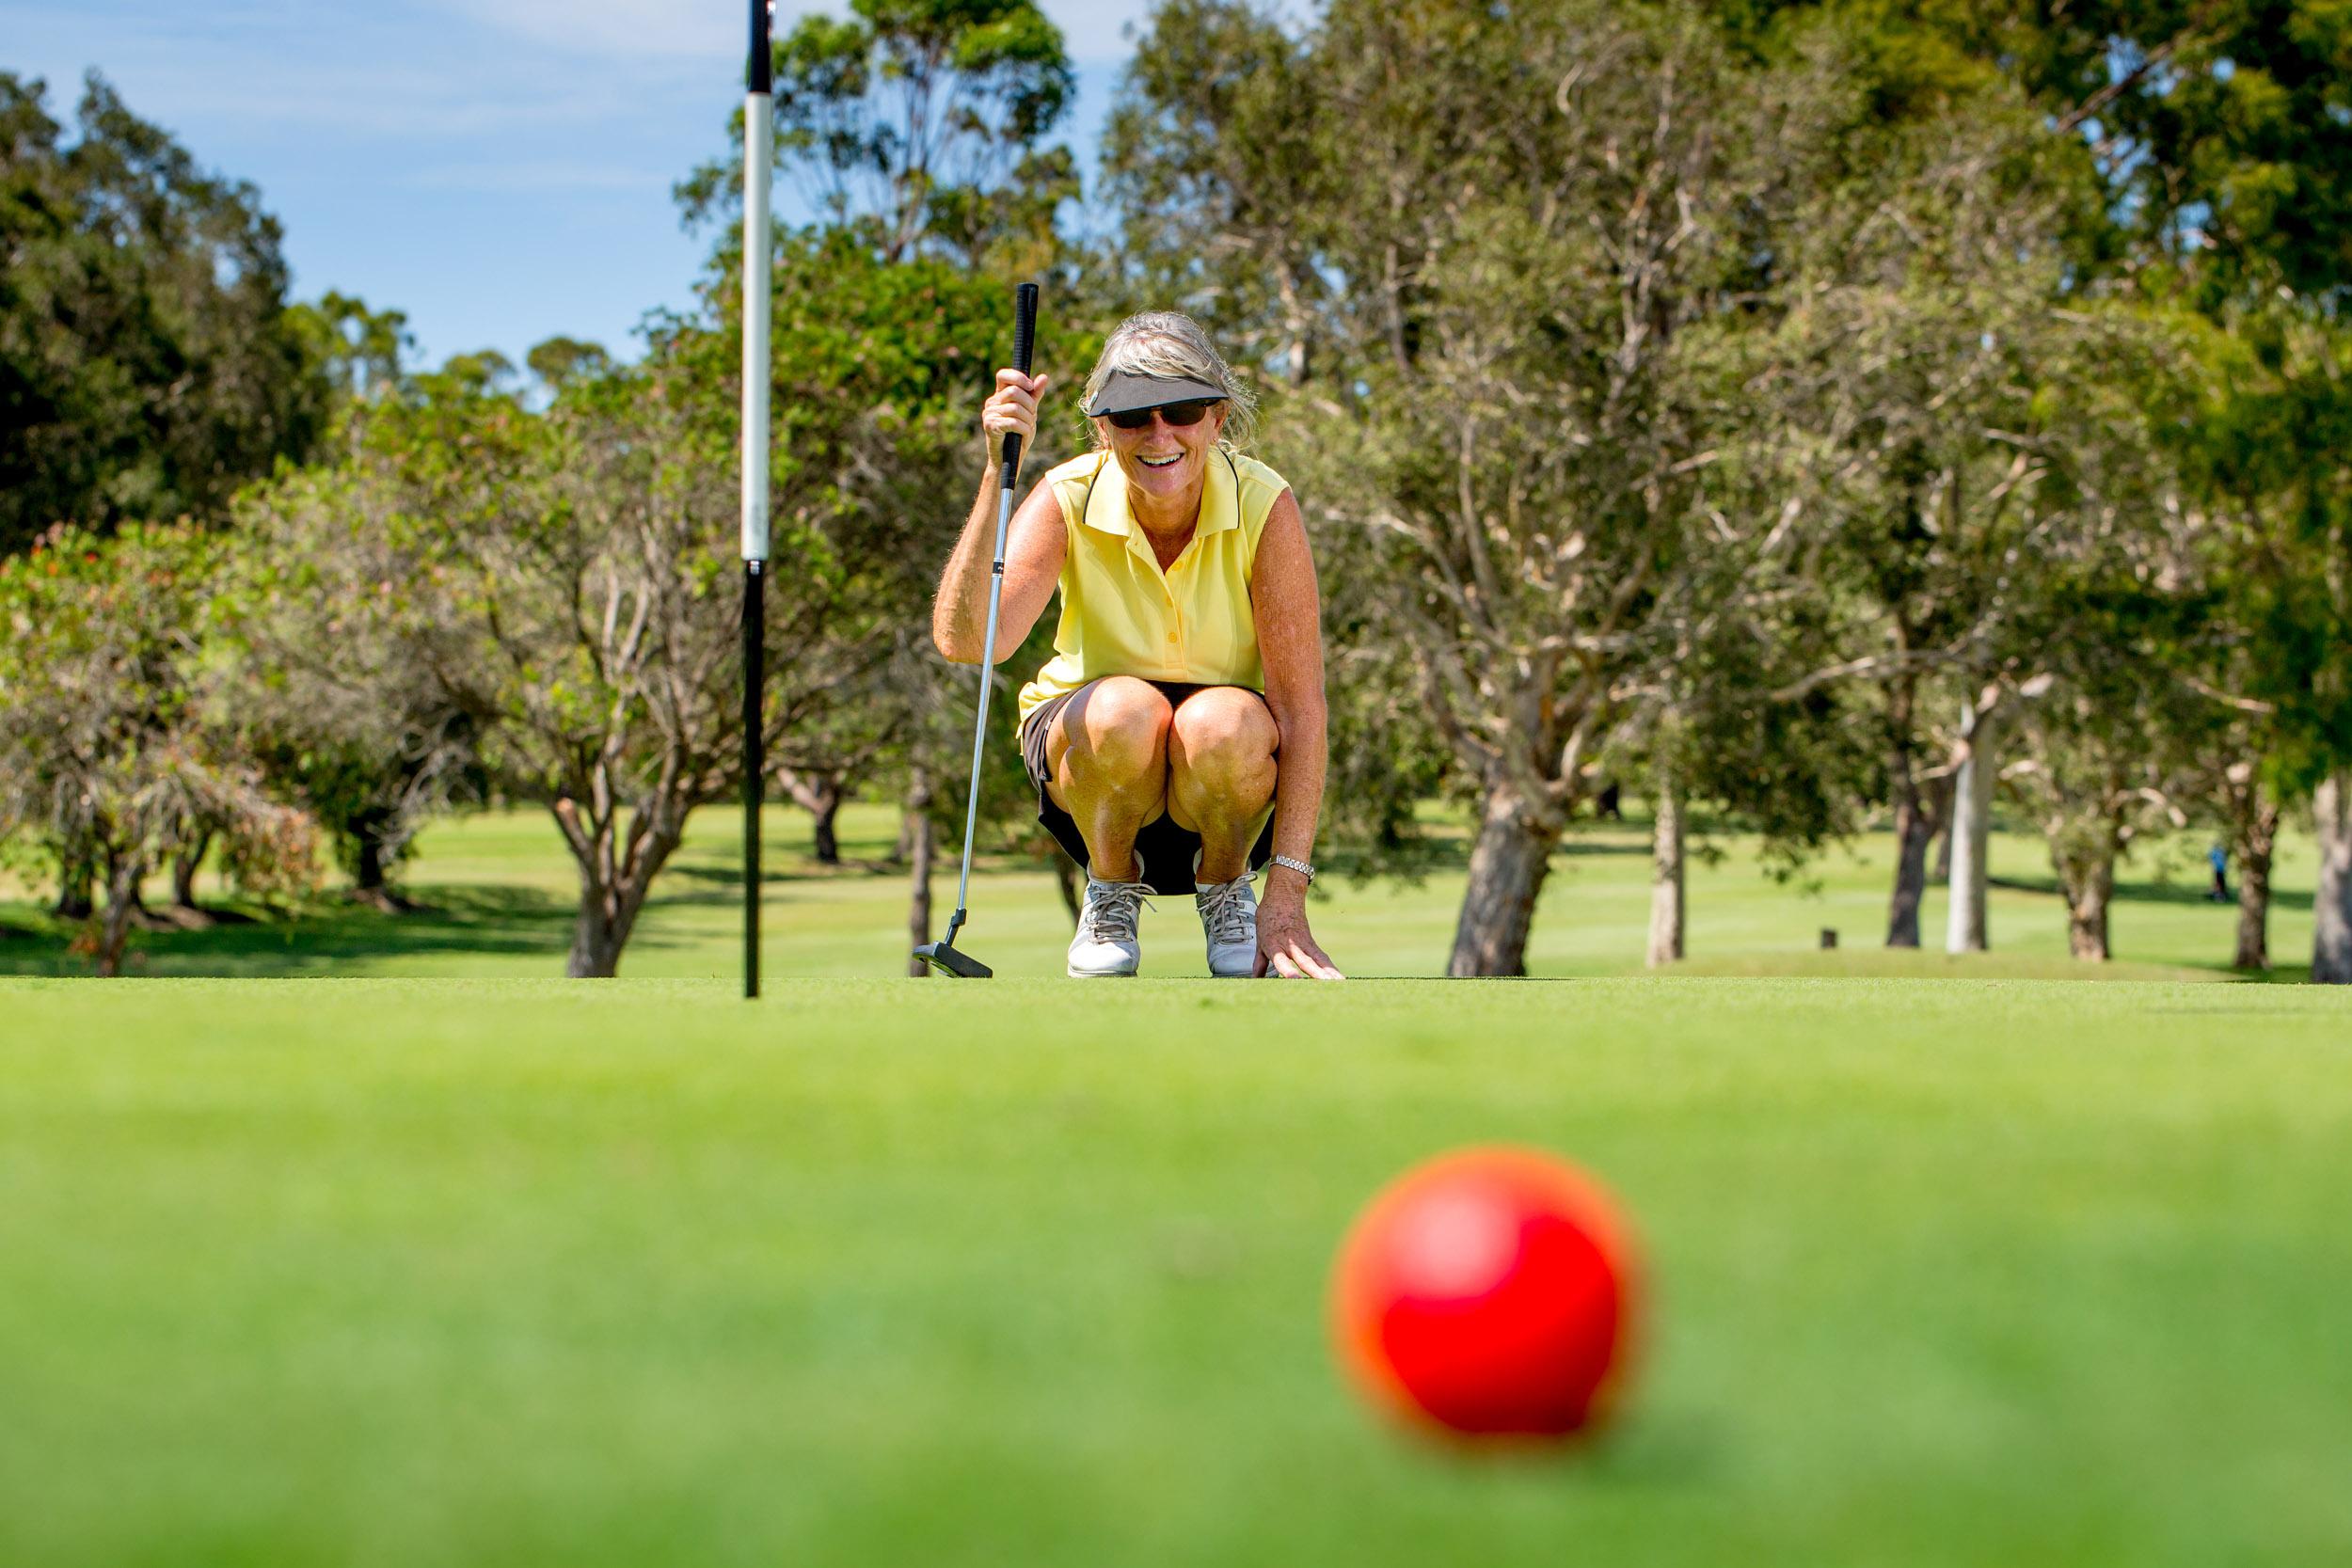 golf-course-photography-clubs.jpg